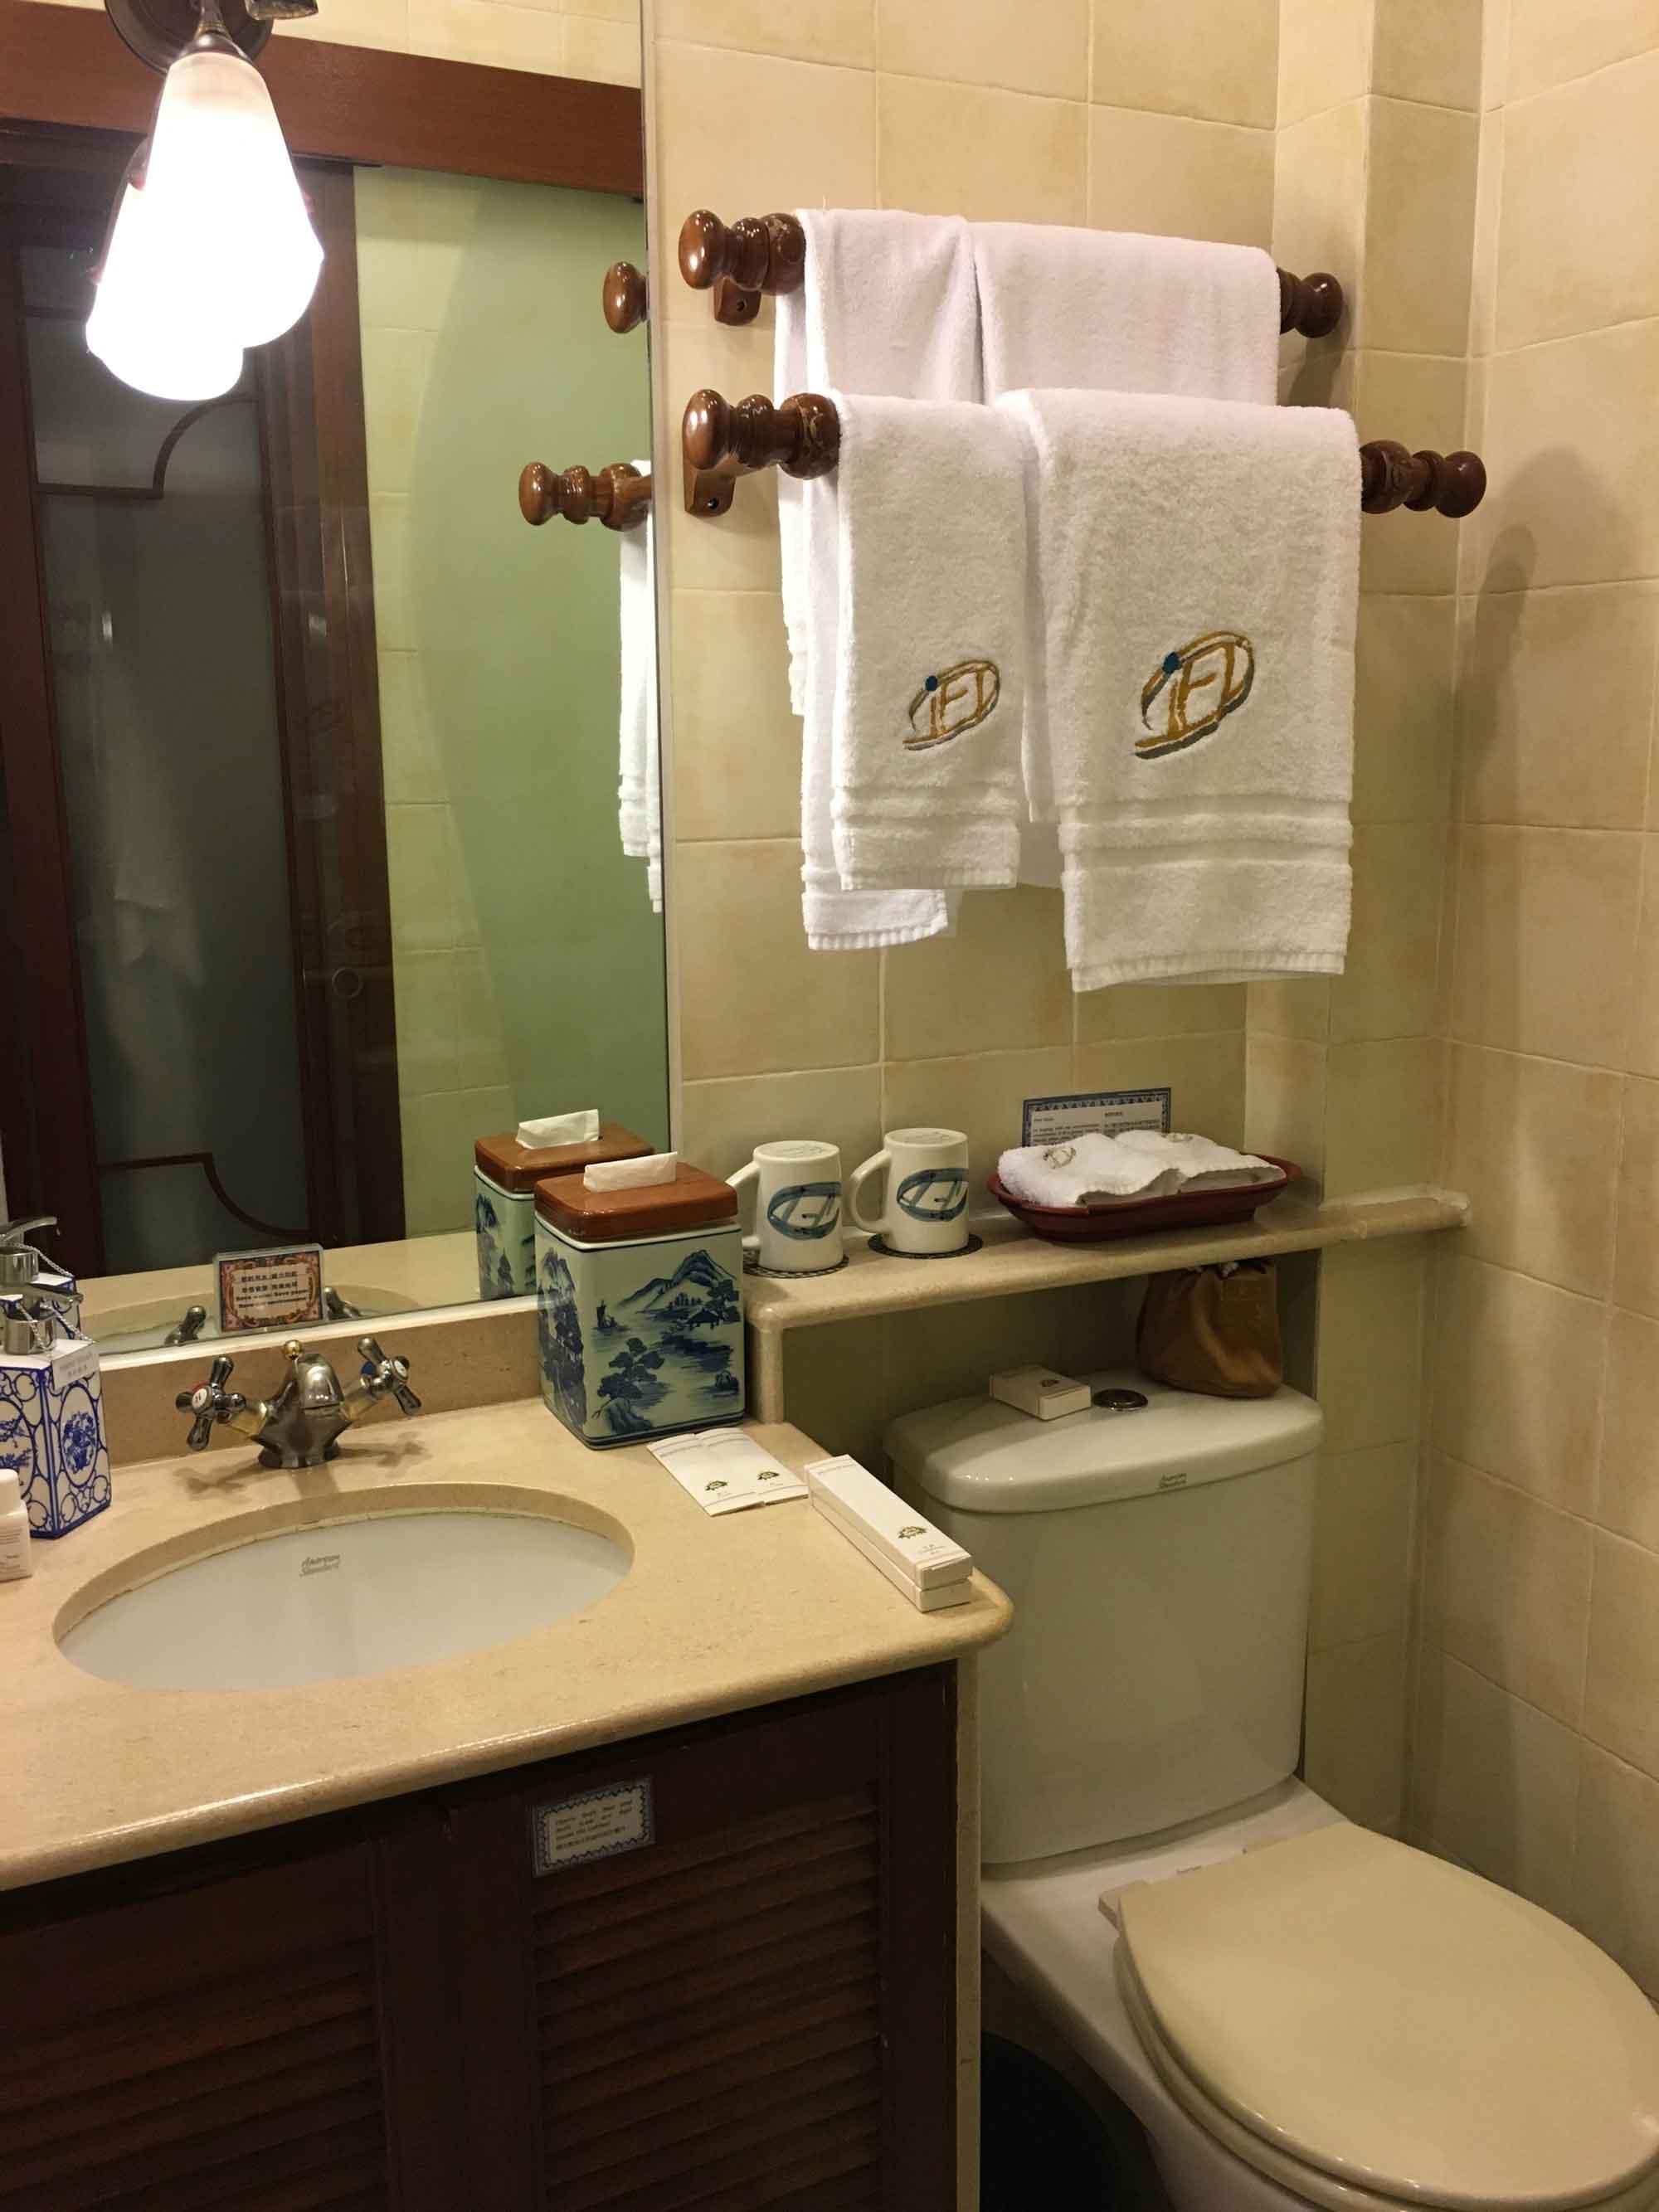 Pousada de Mong Ha Standard Room bathroom